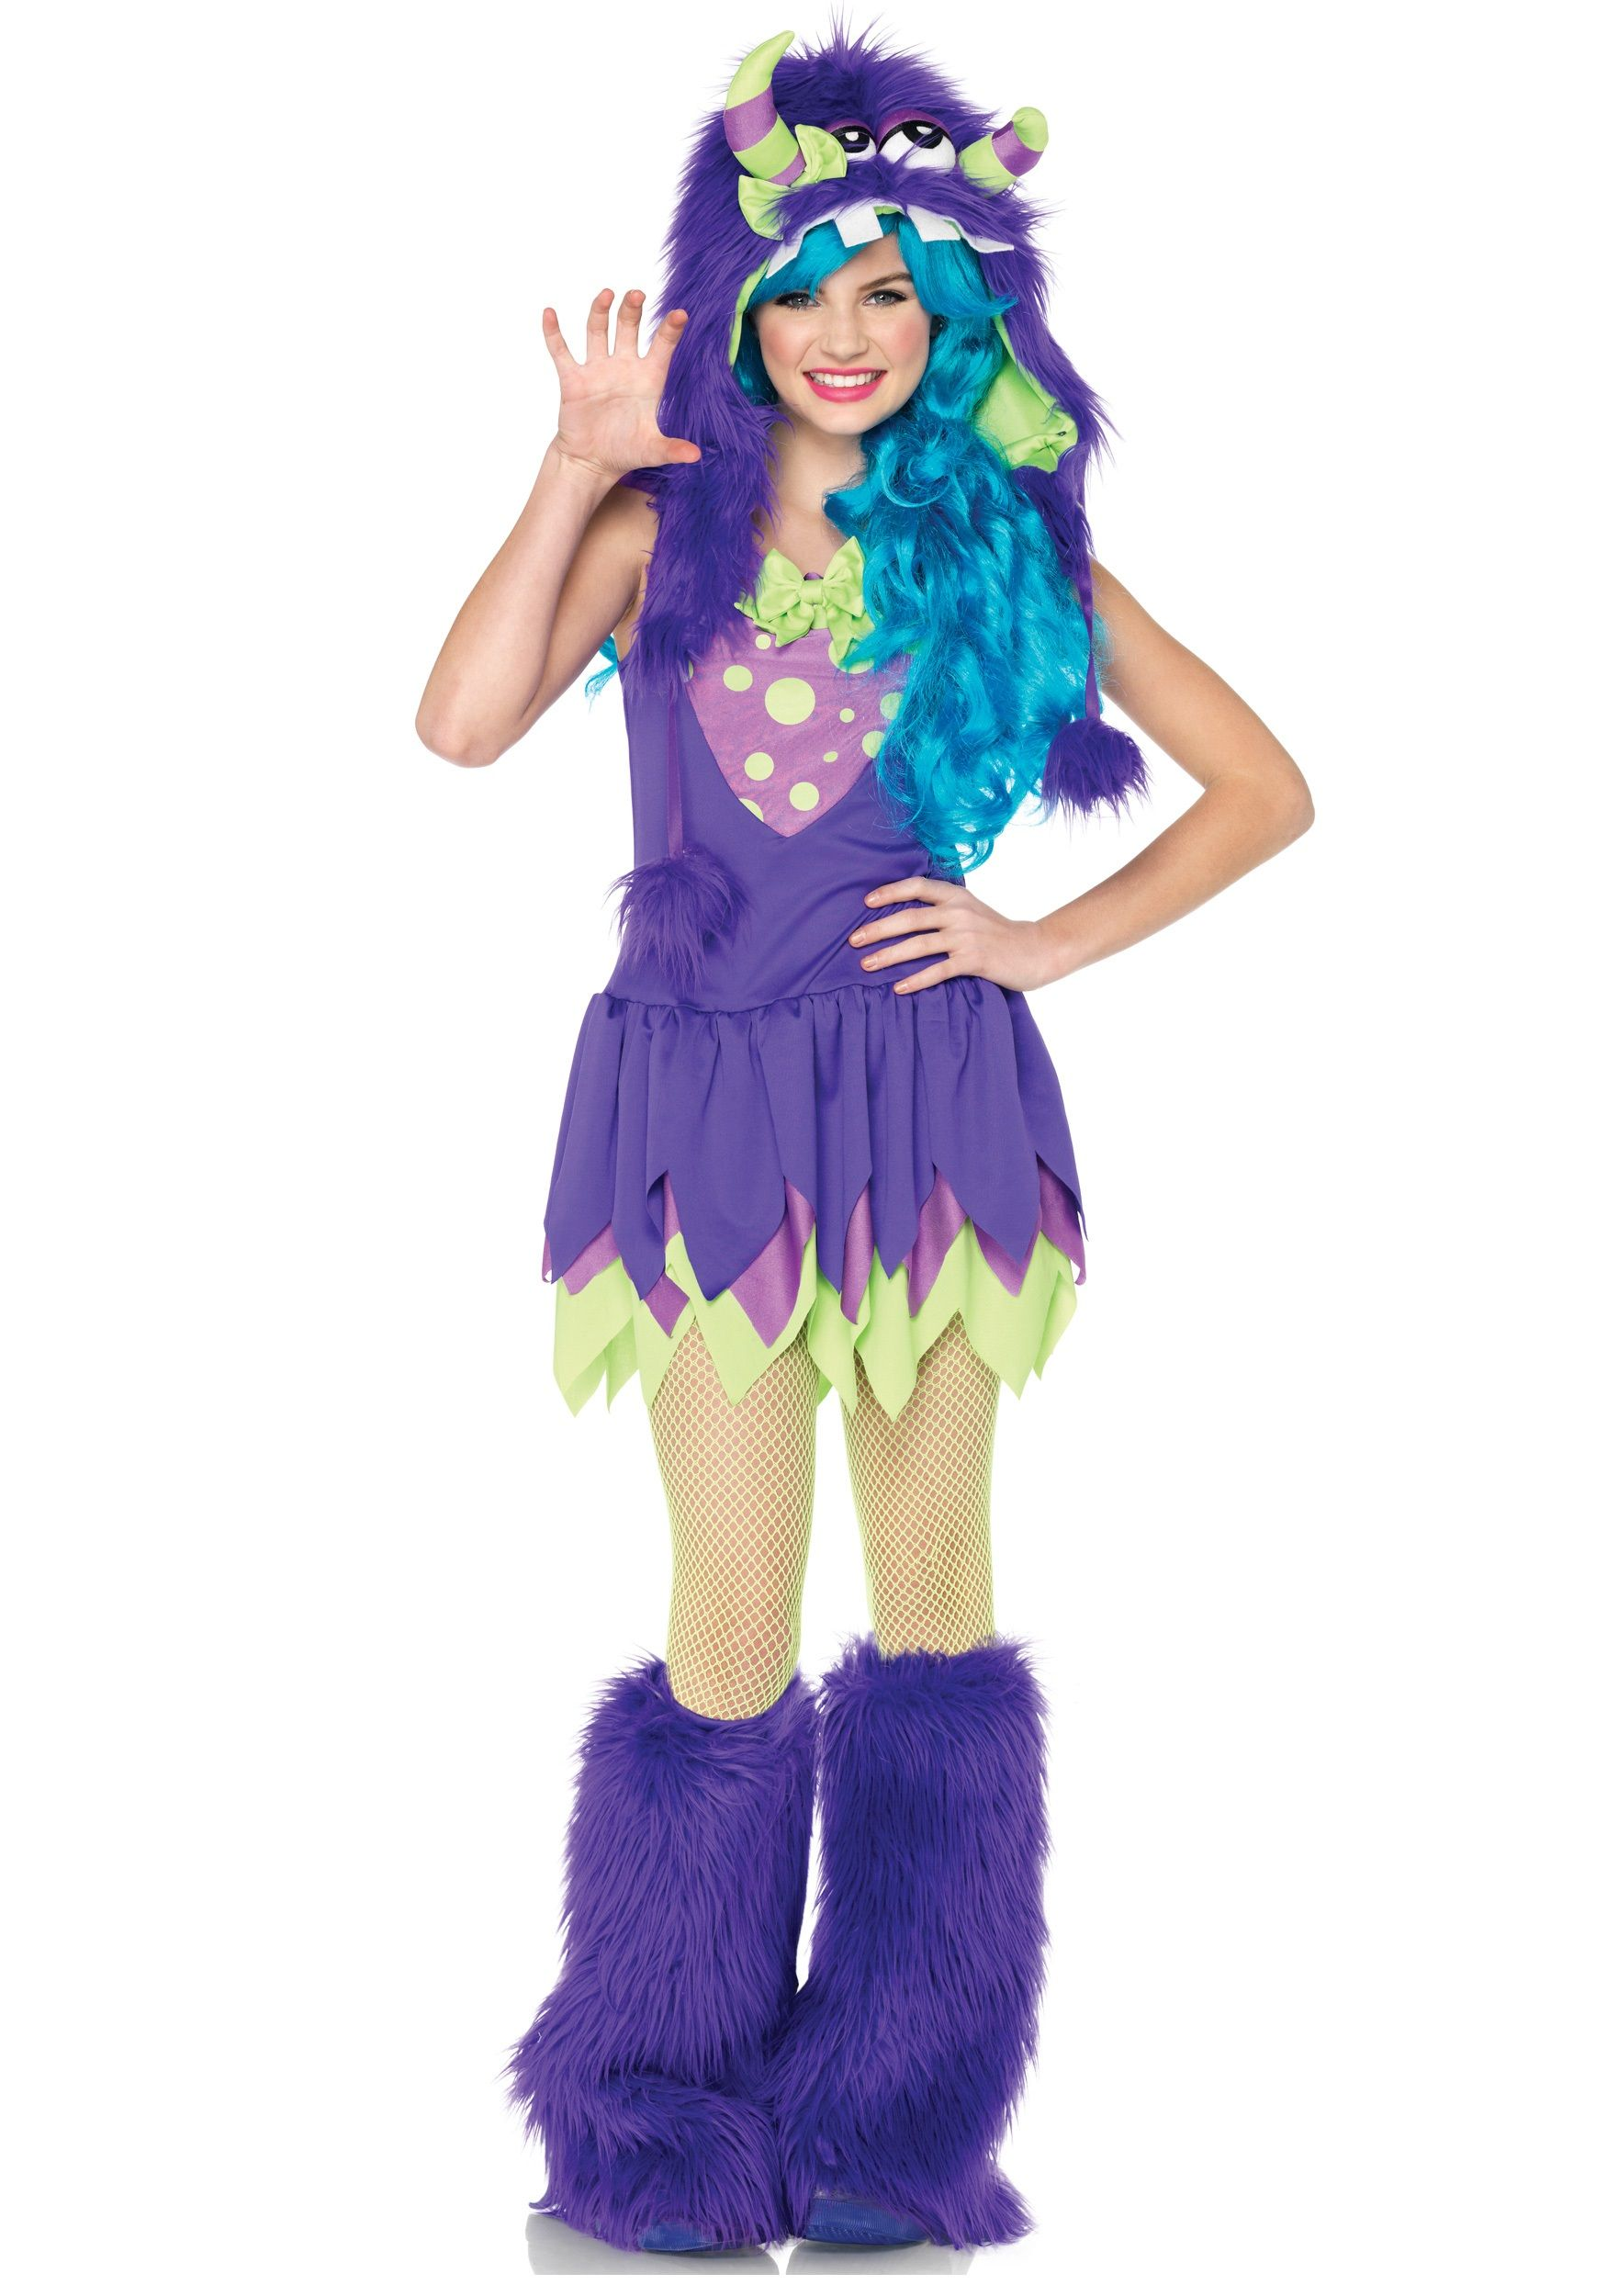 Homemade Halloween Costumes for Tweens Teenage Girl